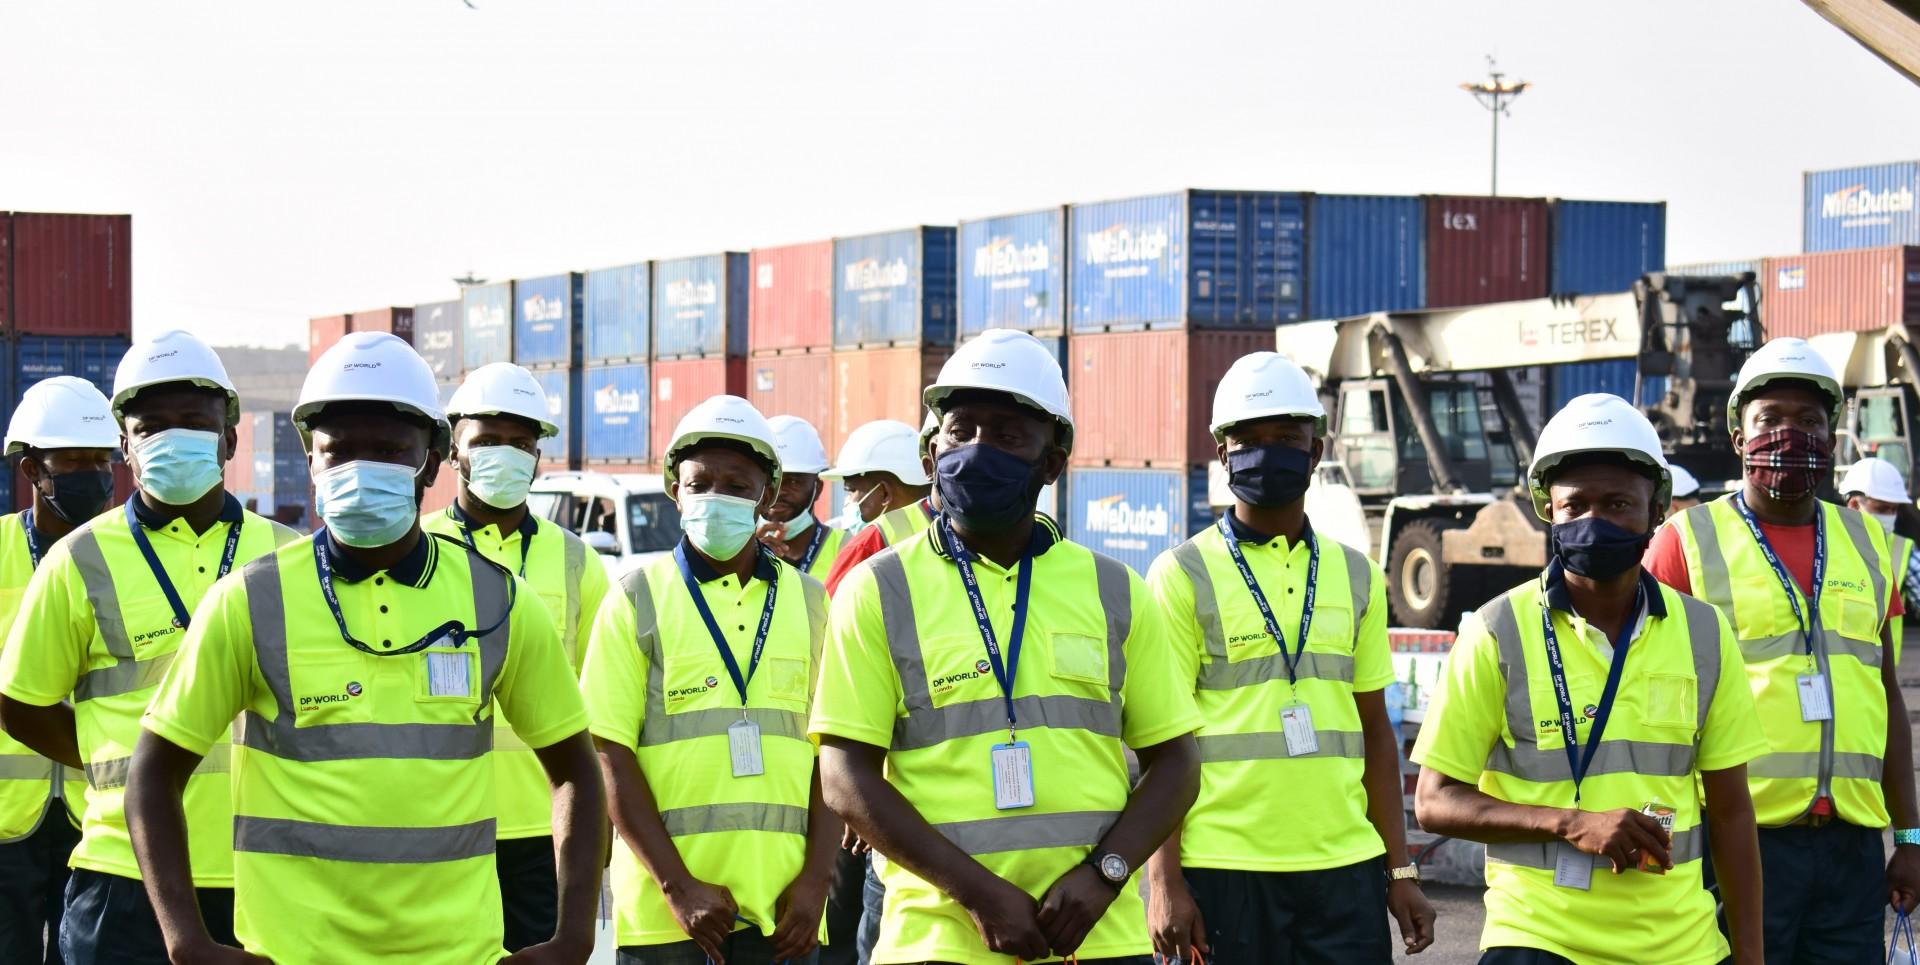 DP World commences operations at Port Luanda